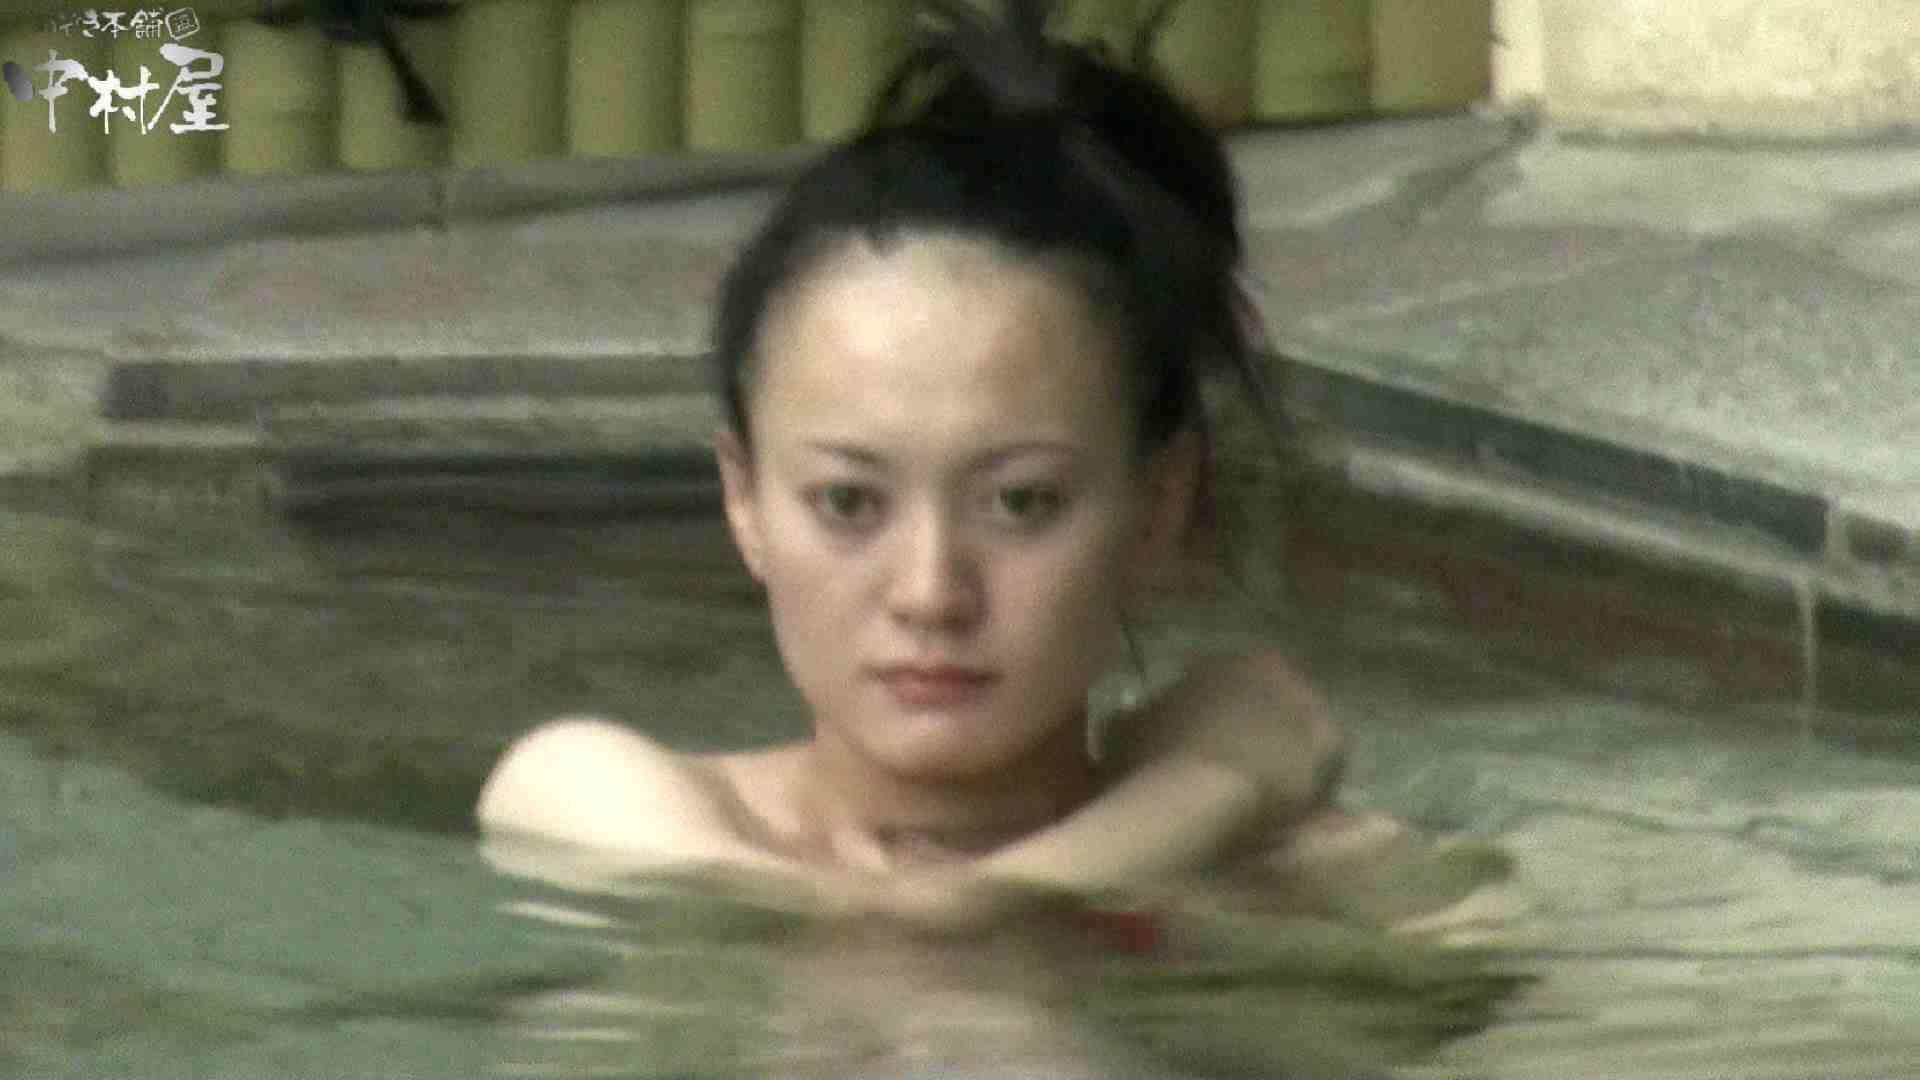 Aquaな露天風呂Vol.900 エロいOL | ガールの盗撮  71枚